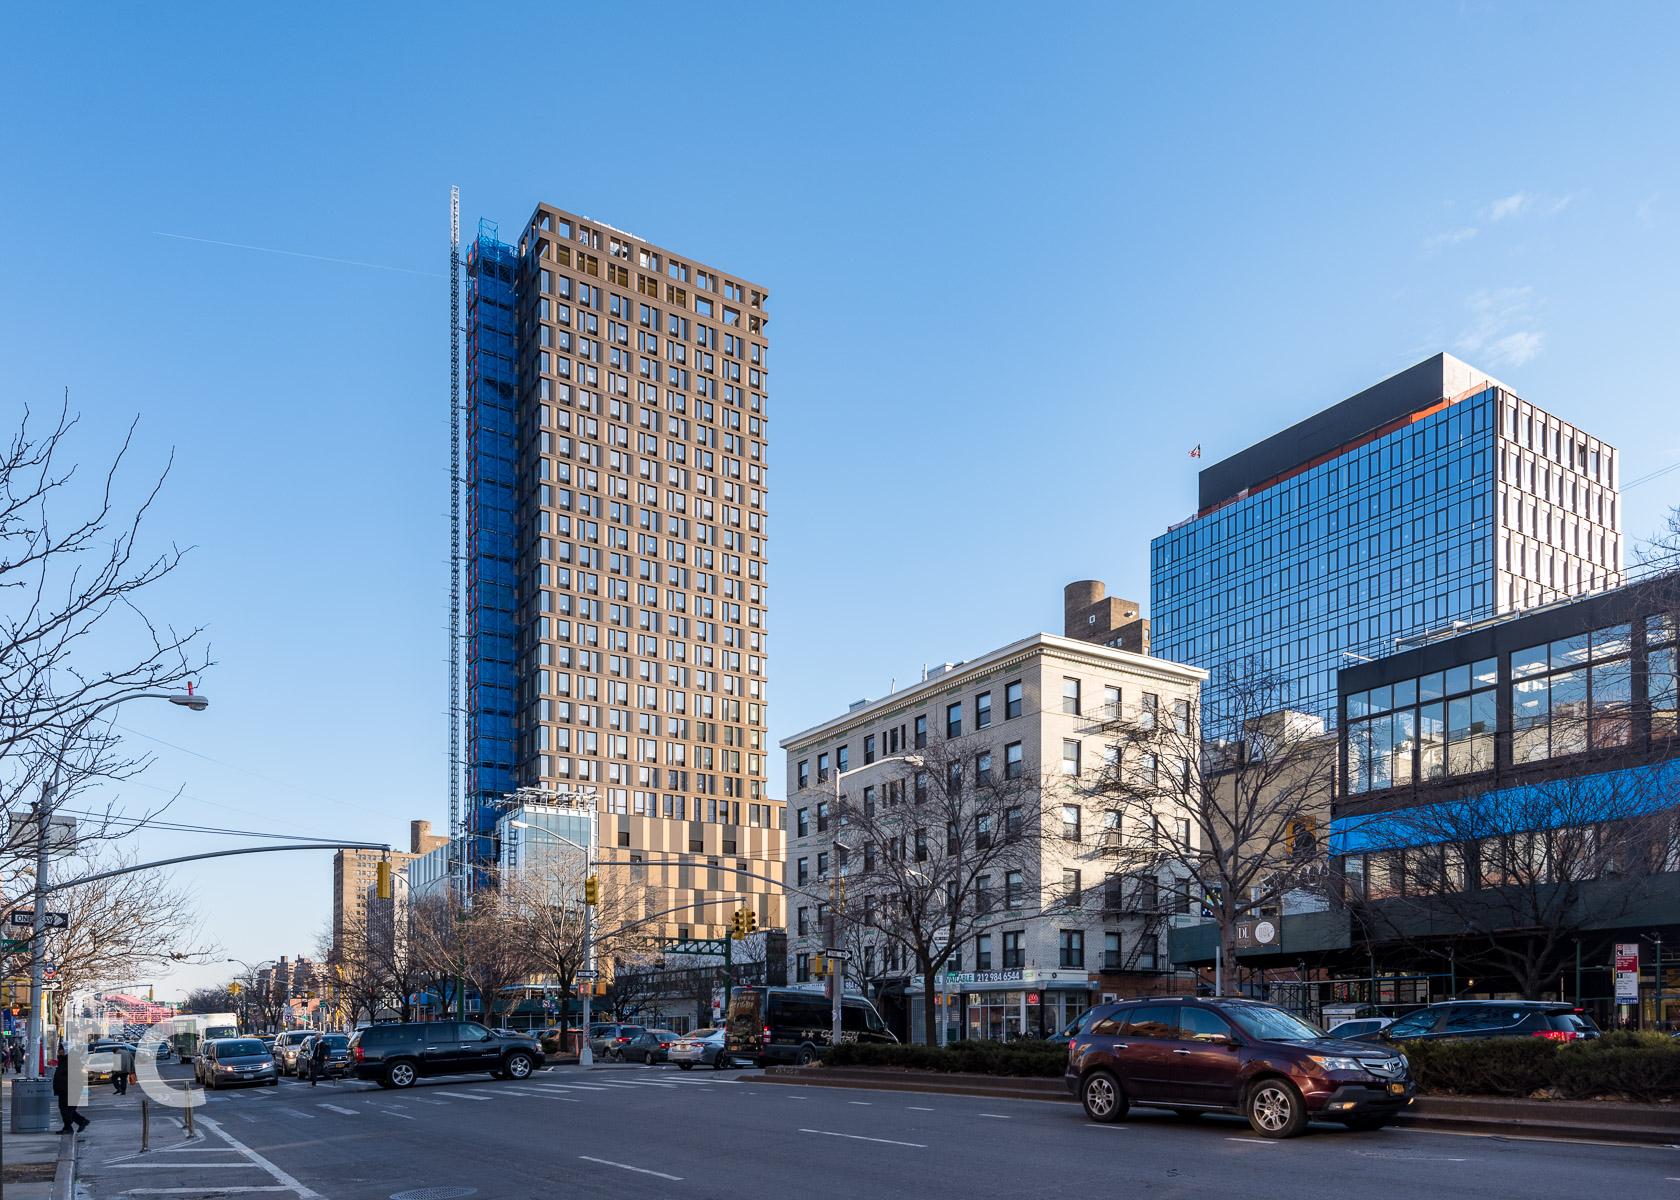 West façade from Delancey Street.